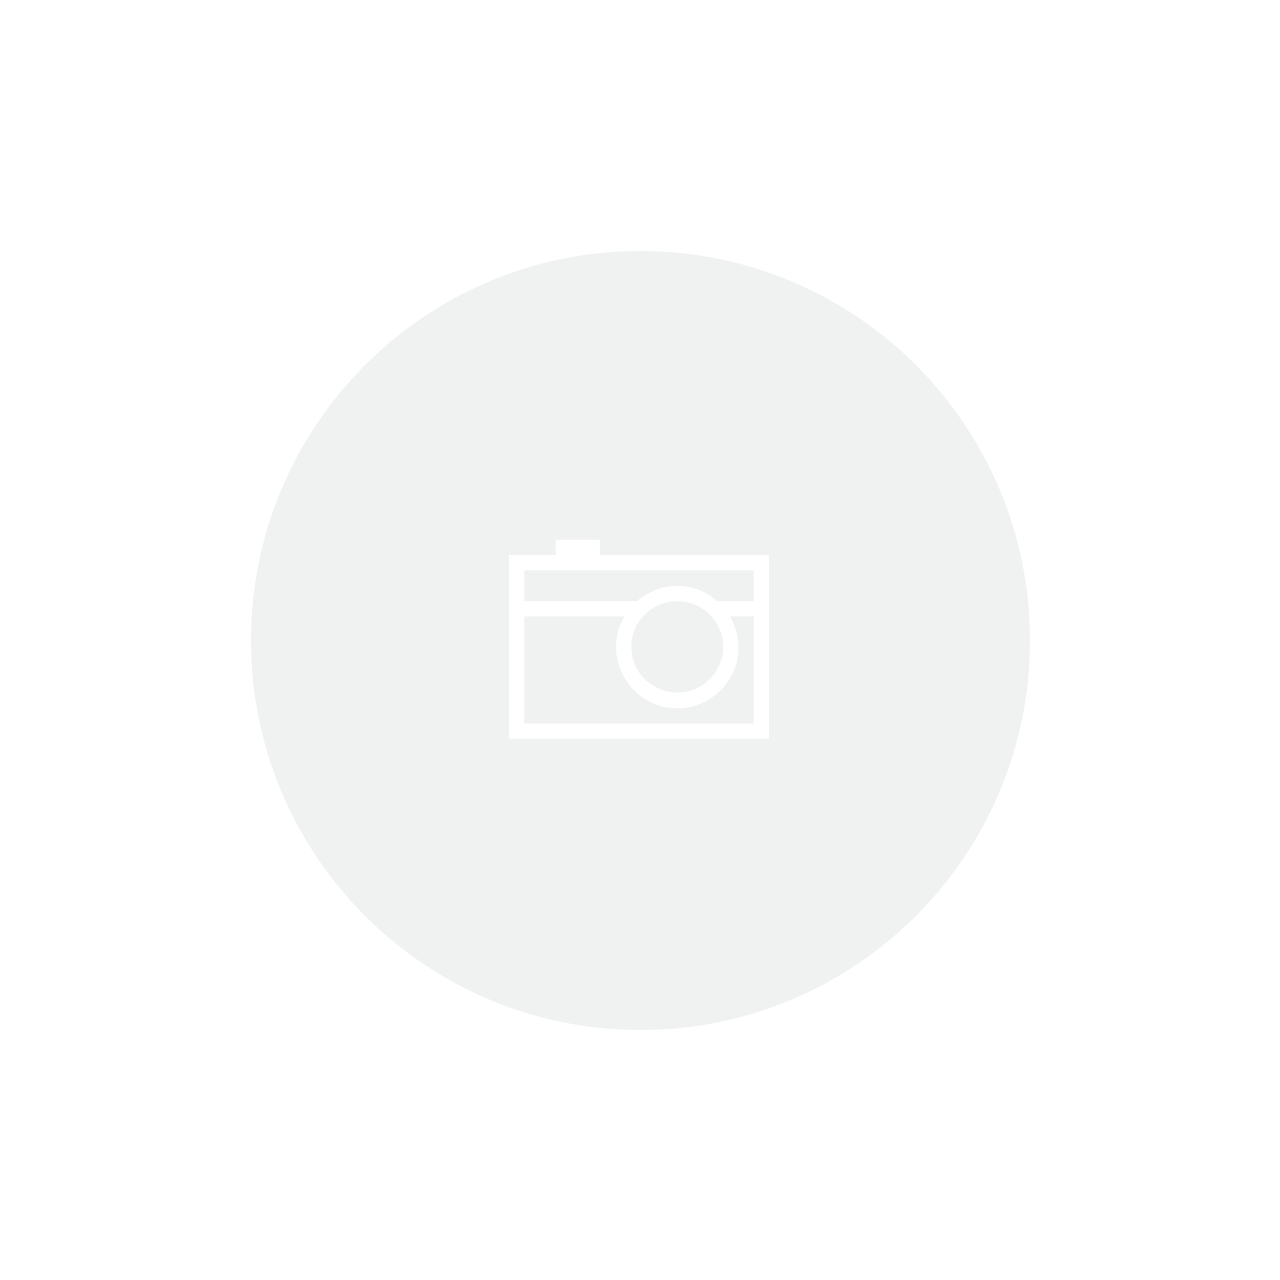 Almofada Veludo Estampado Preto, Cinza e Verde